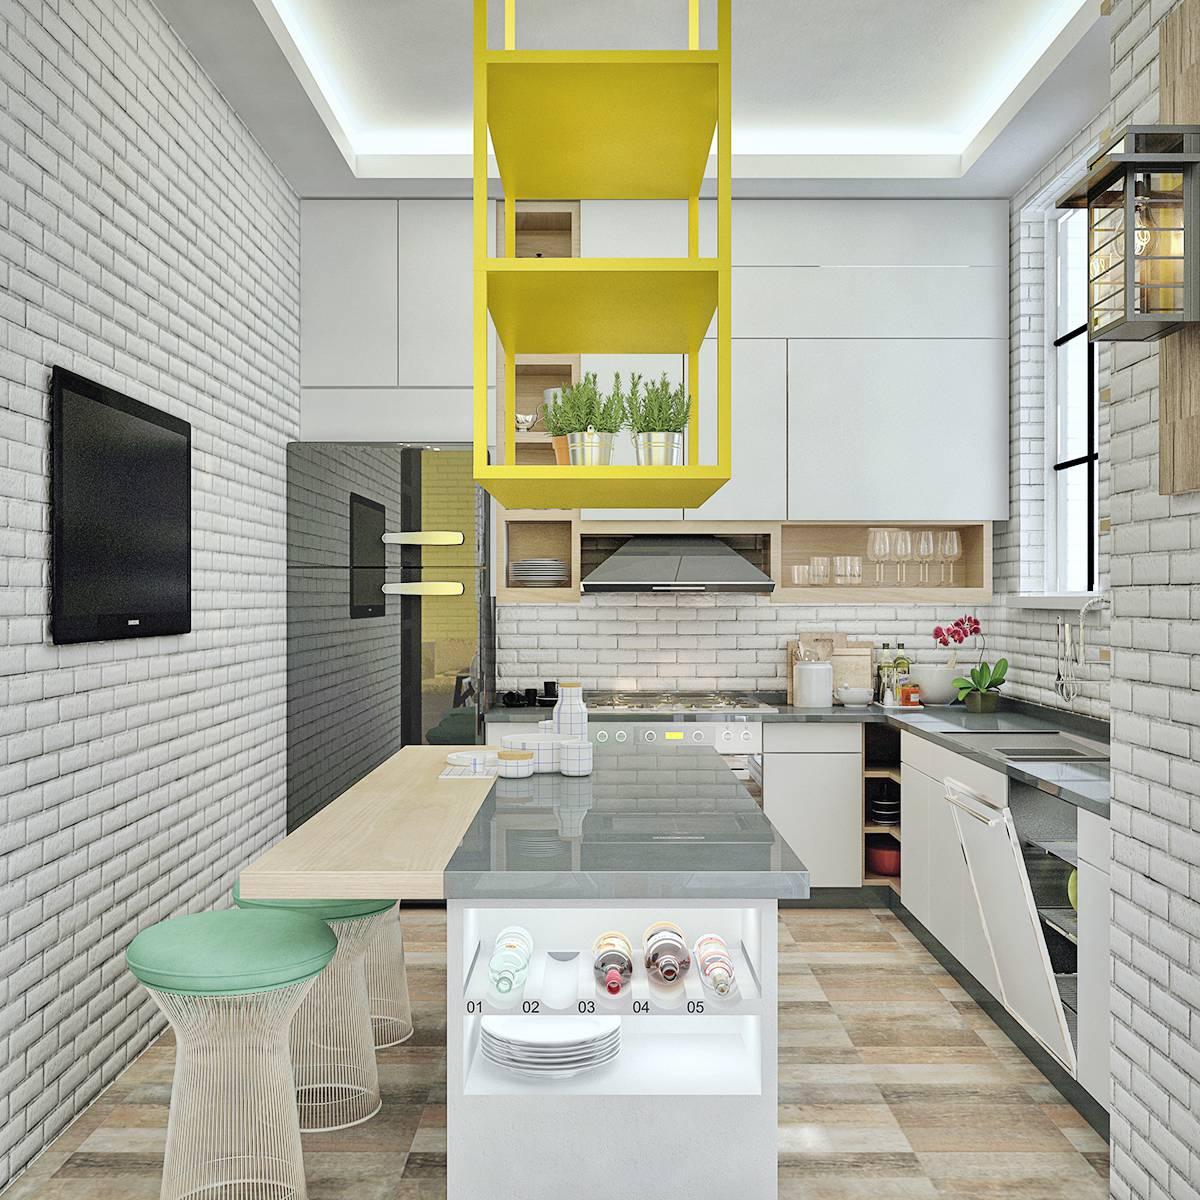 scandinavian-exposed-brick-kitchen-yellow-accents